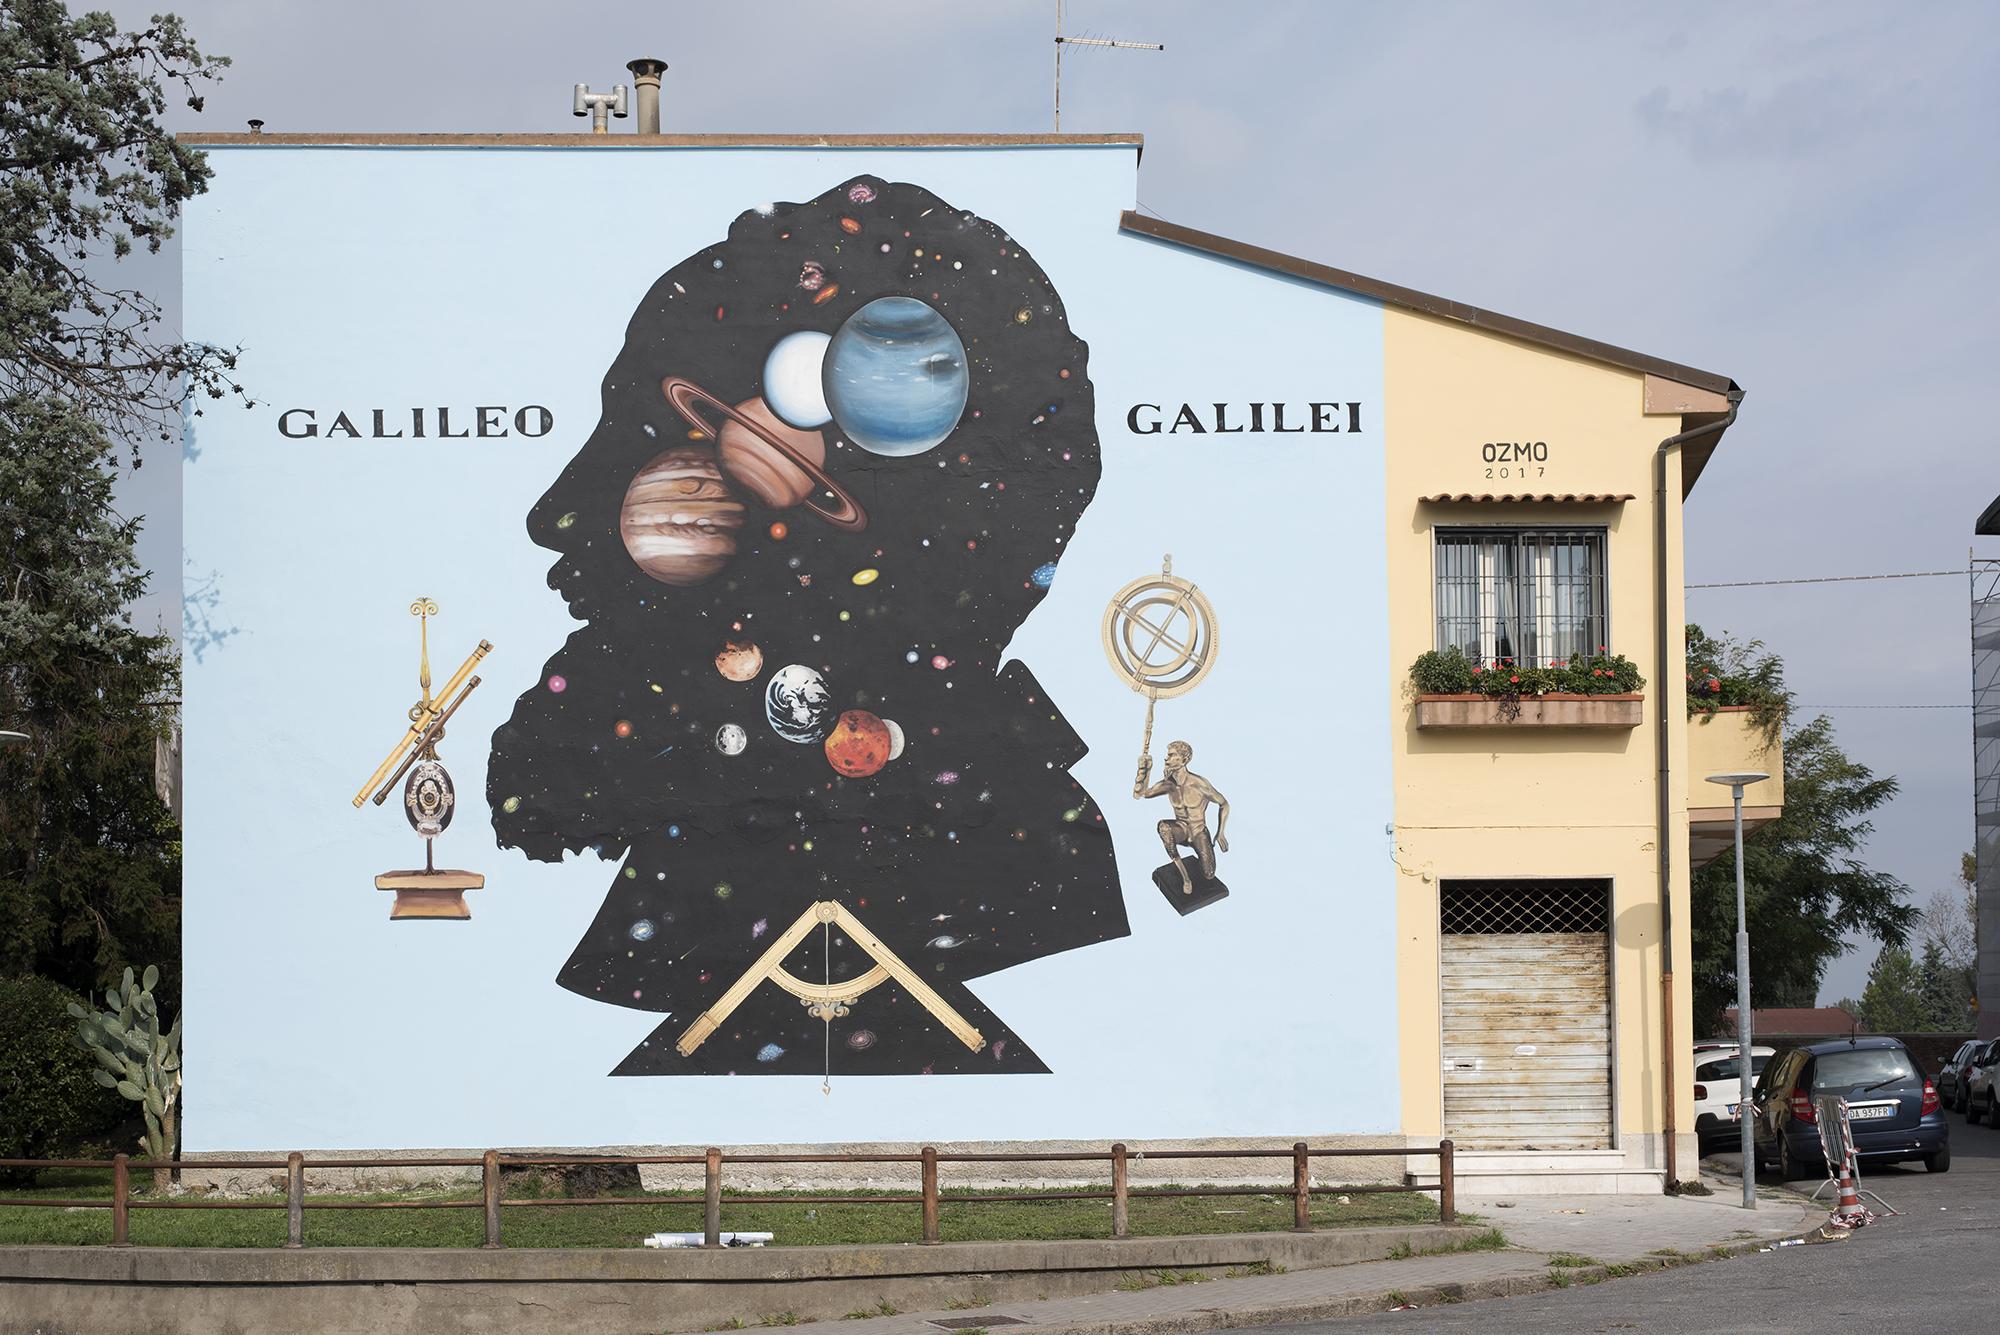 Ozmo Street Art Galileo Galilei Pisa